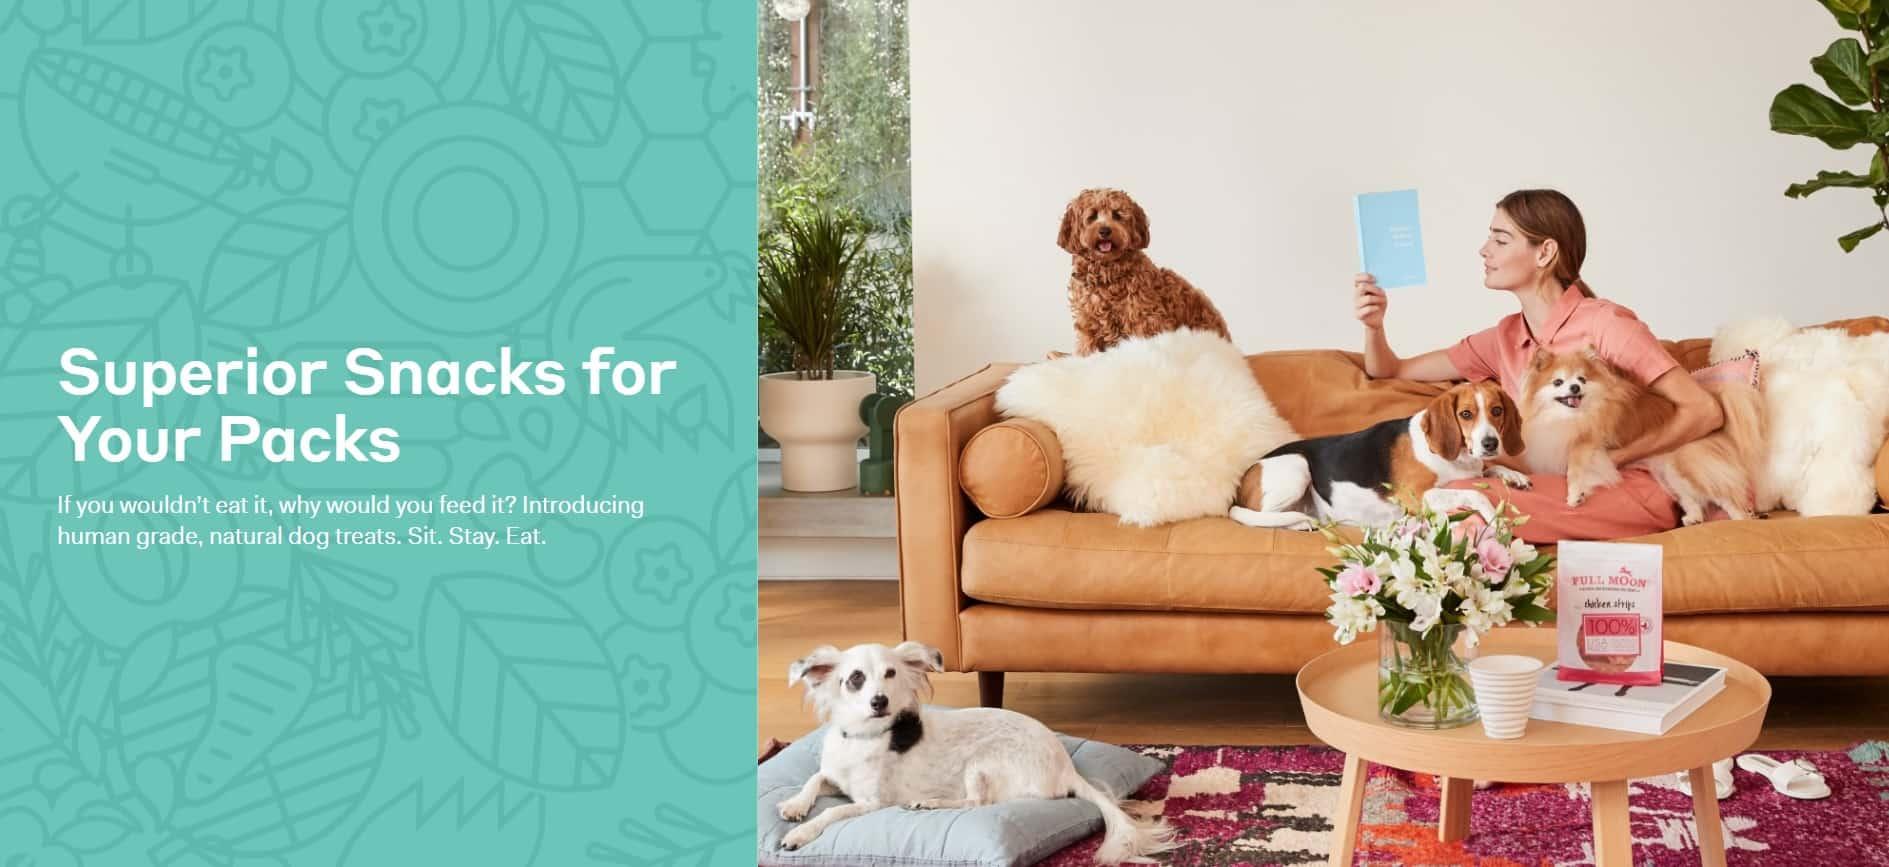 Full Moon Dog Treats Review 2020: Best Human-Grade Treats? 11